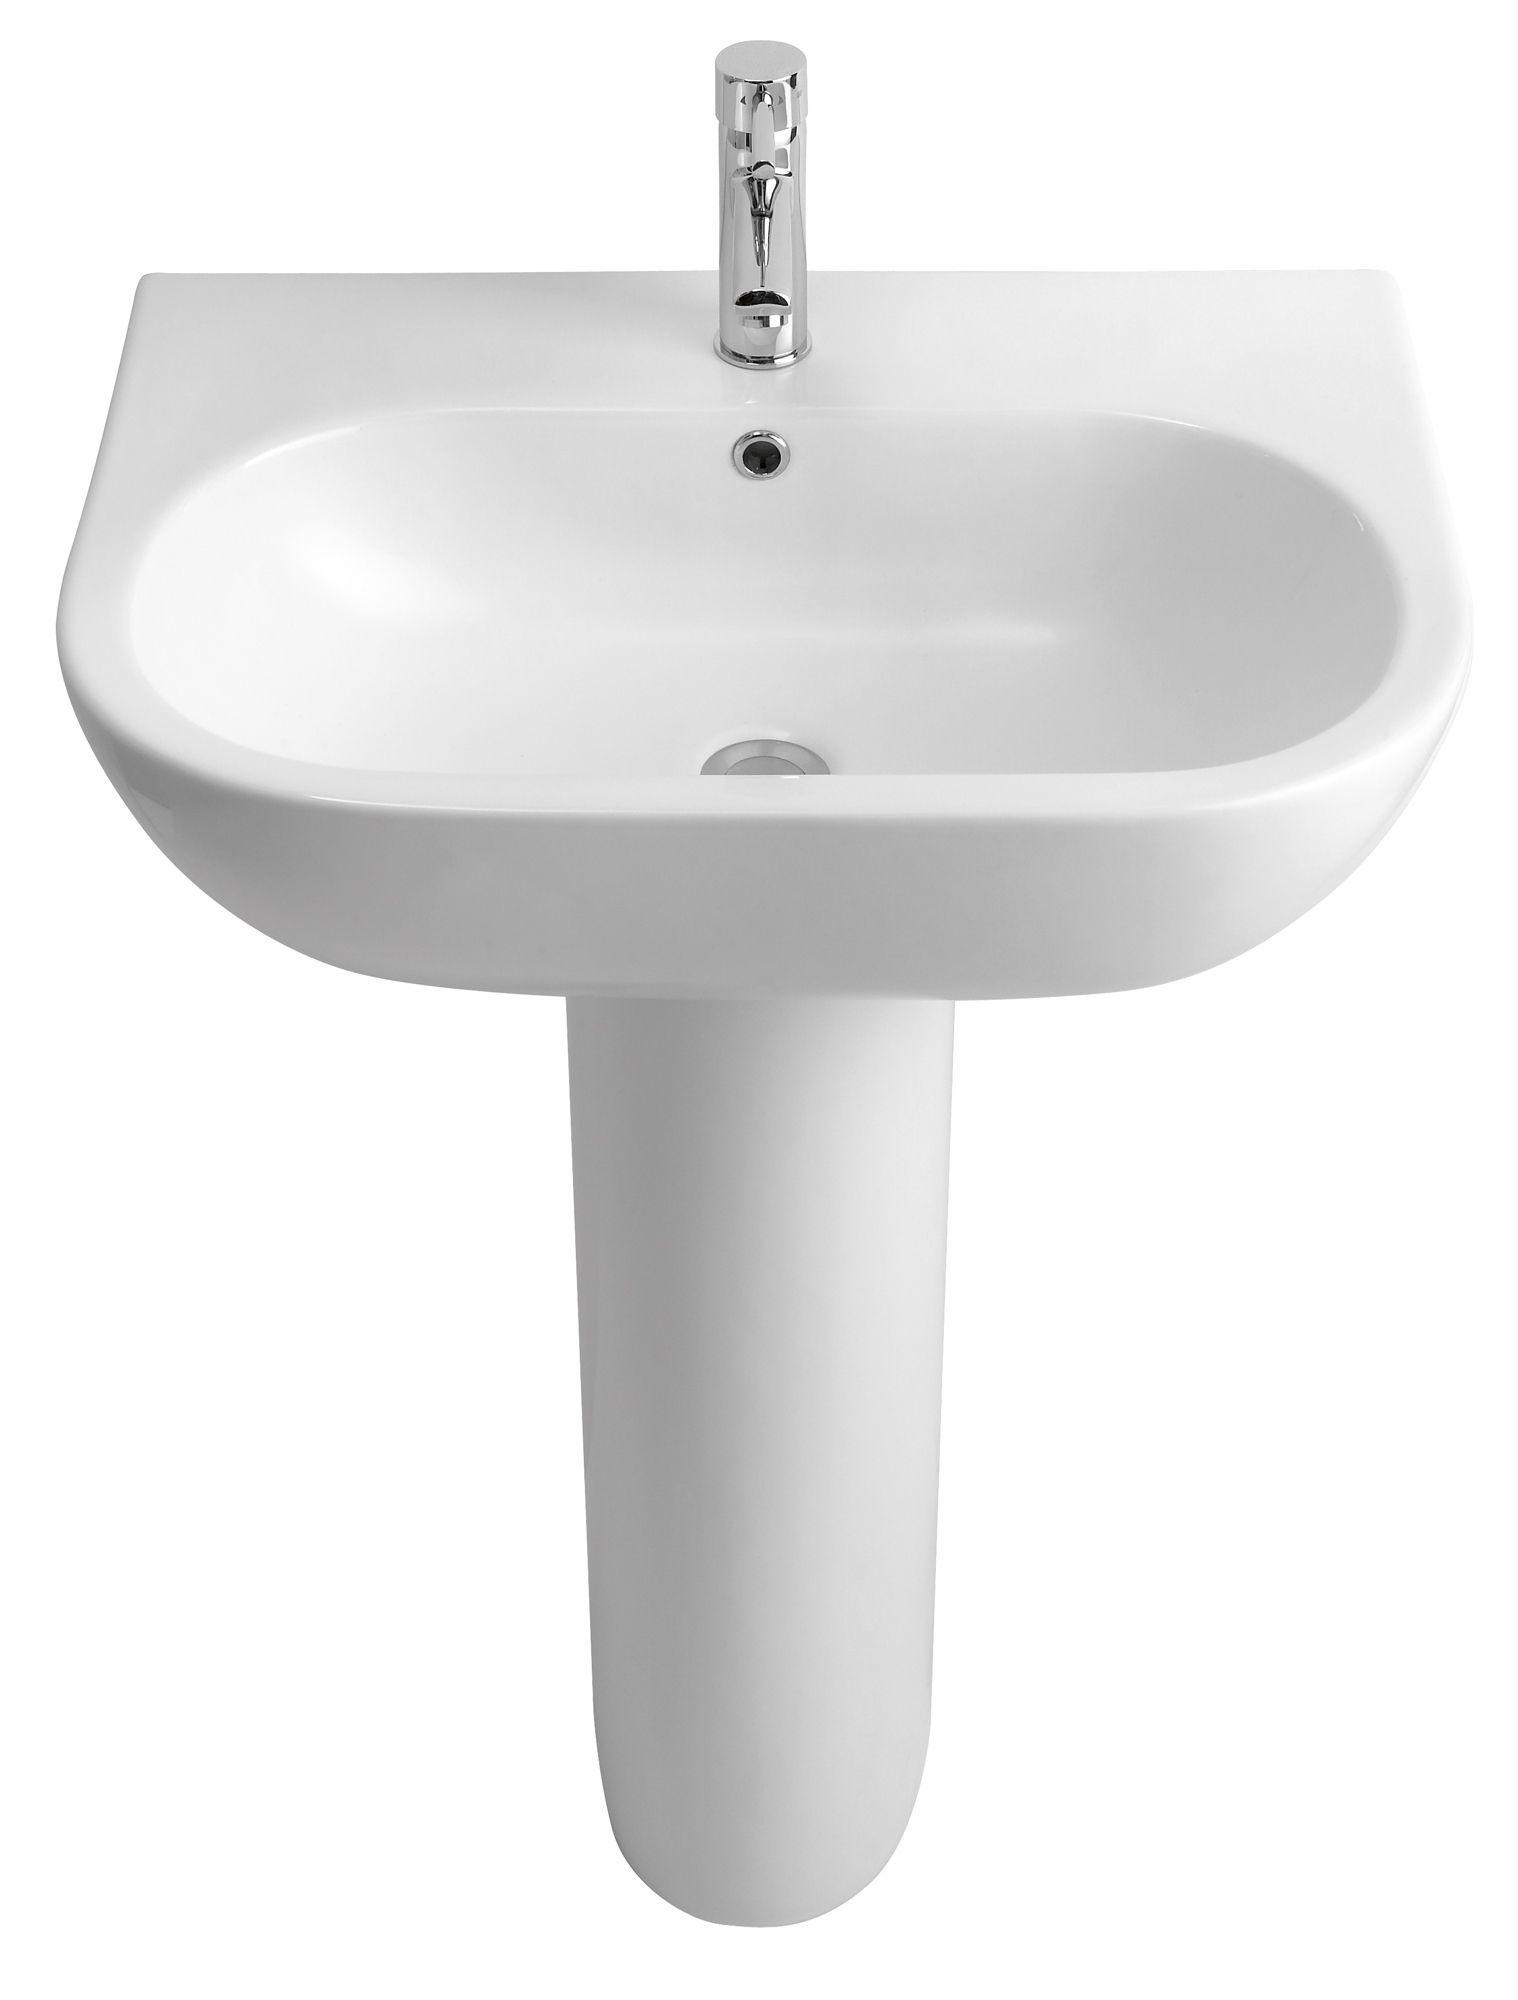 Cooke Lewis Helena Full Pedestal Basin Departments Diy At B Q Pedestal Basin Basin Complete Bathrooms